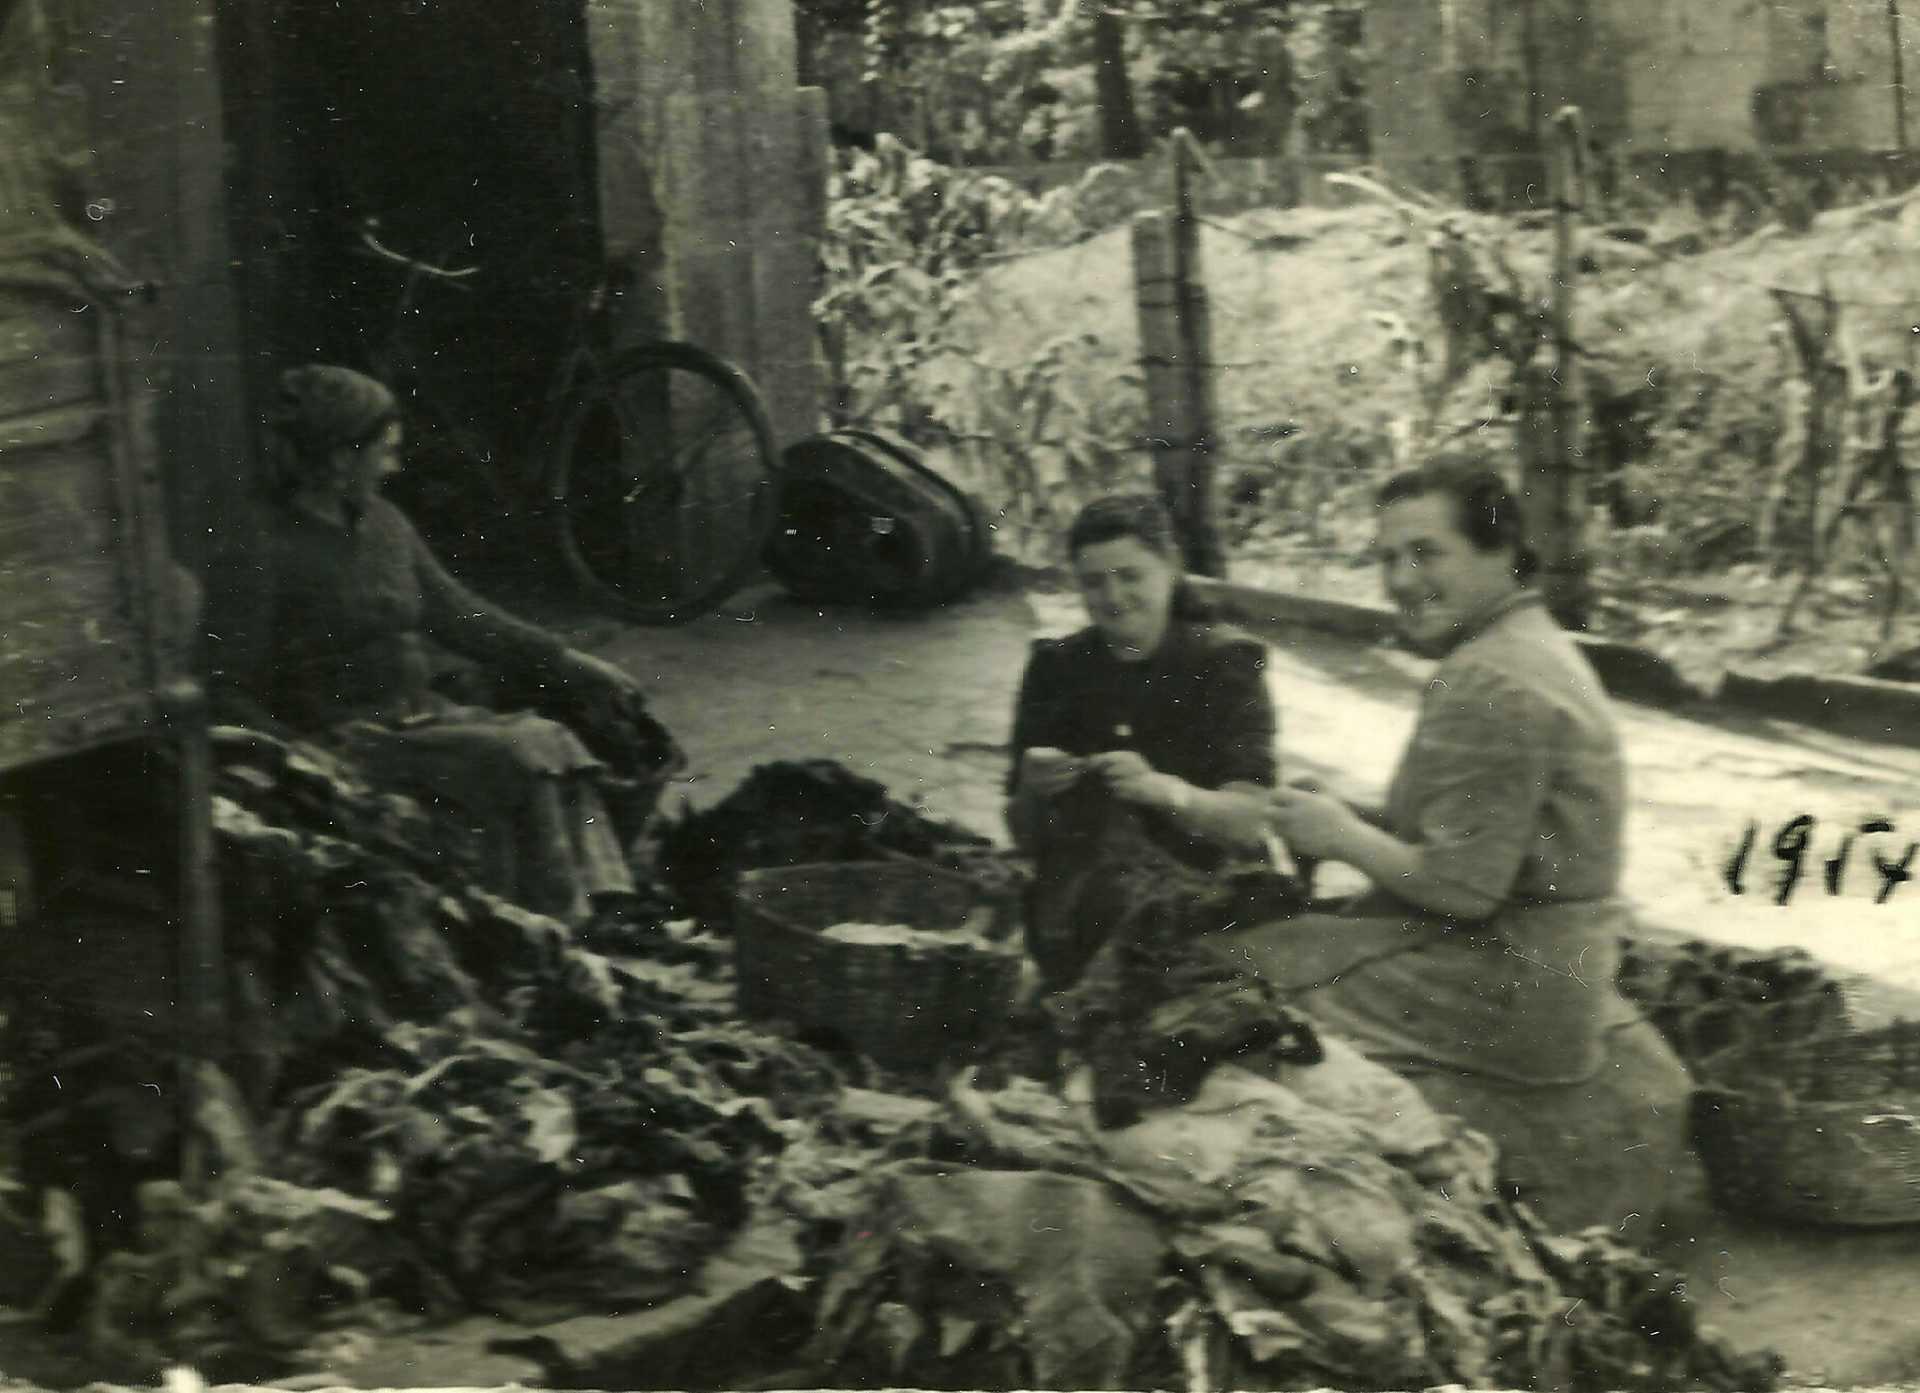 Dalia, Rosa e Juana seleccionando farrapos